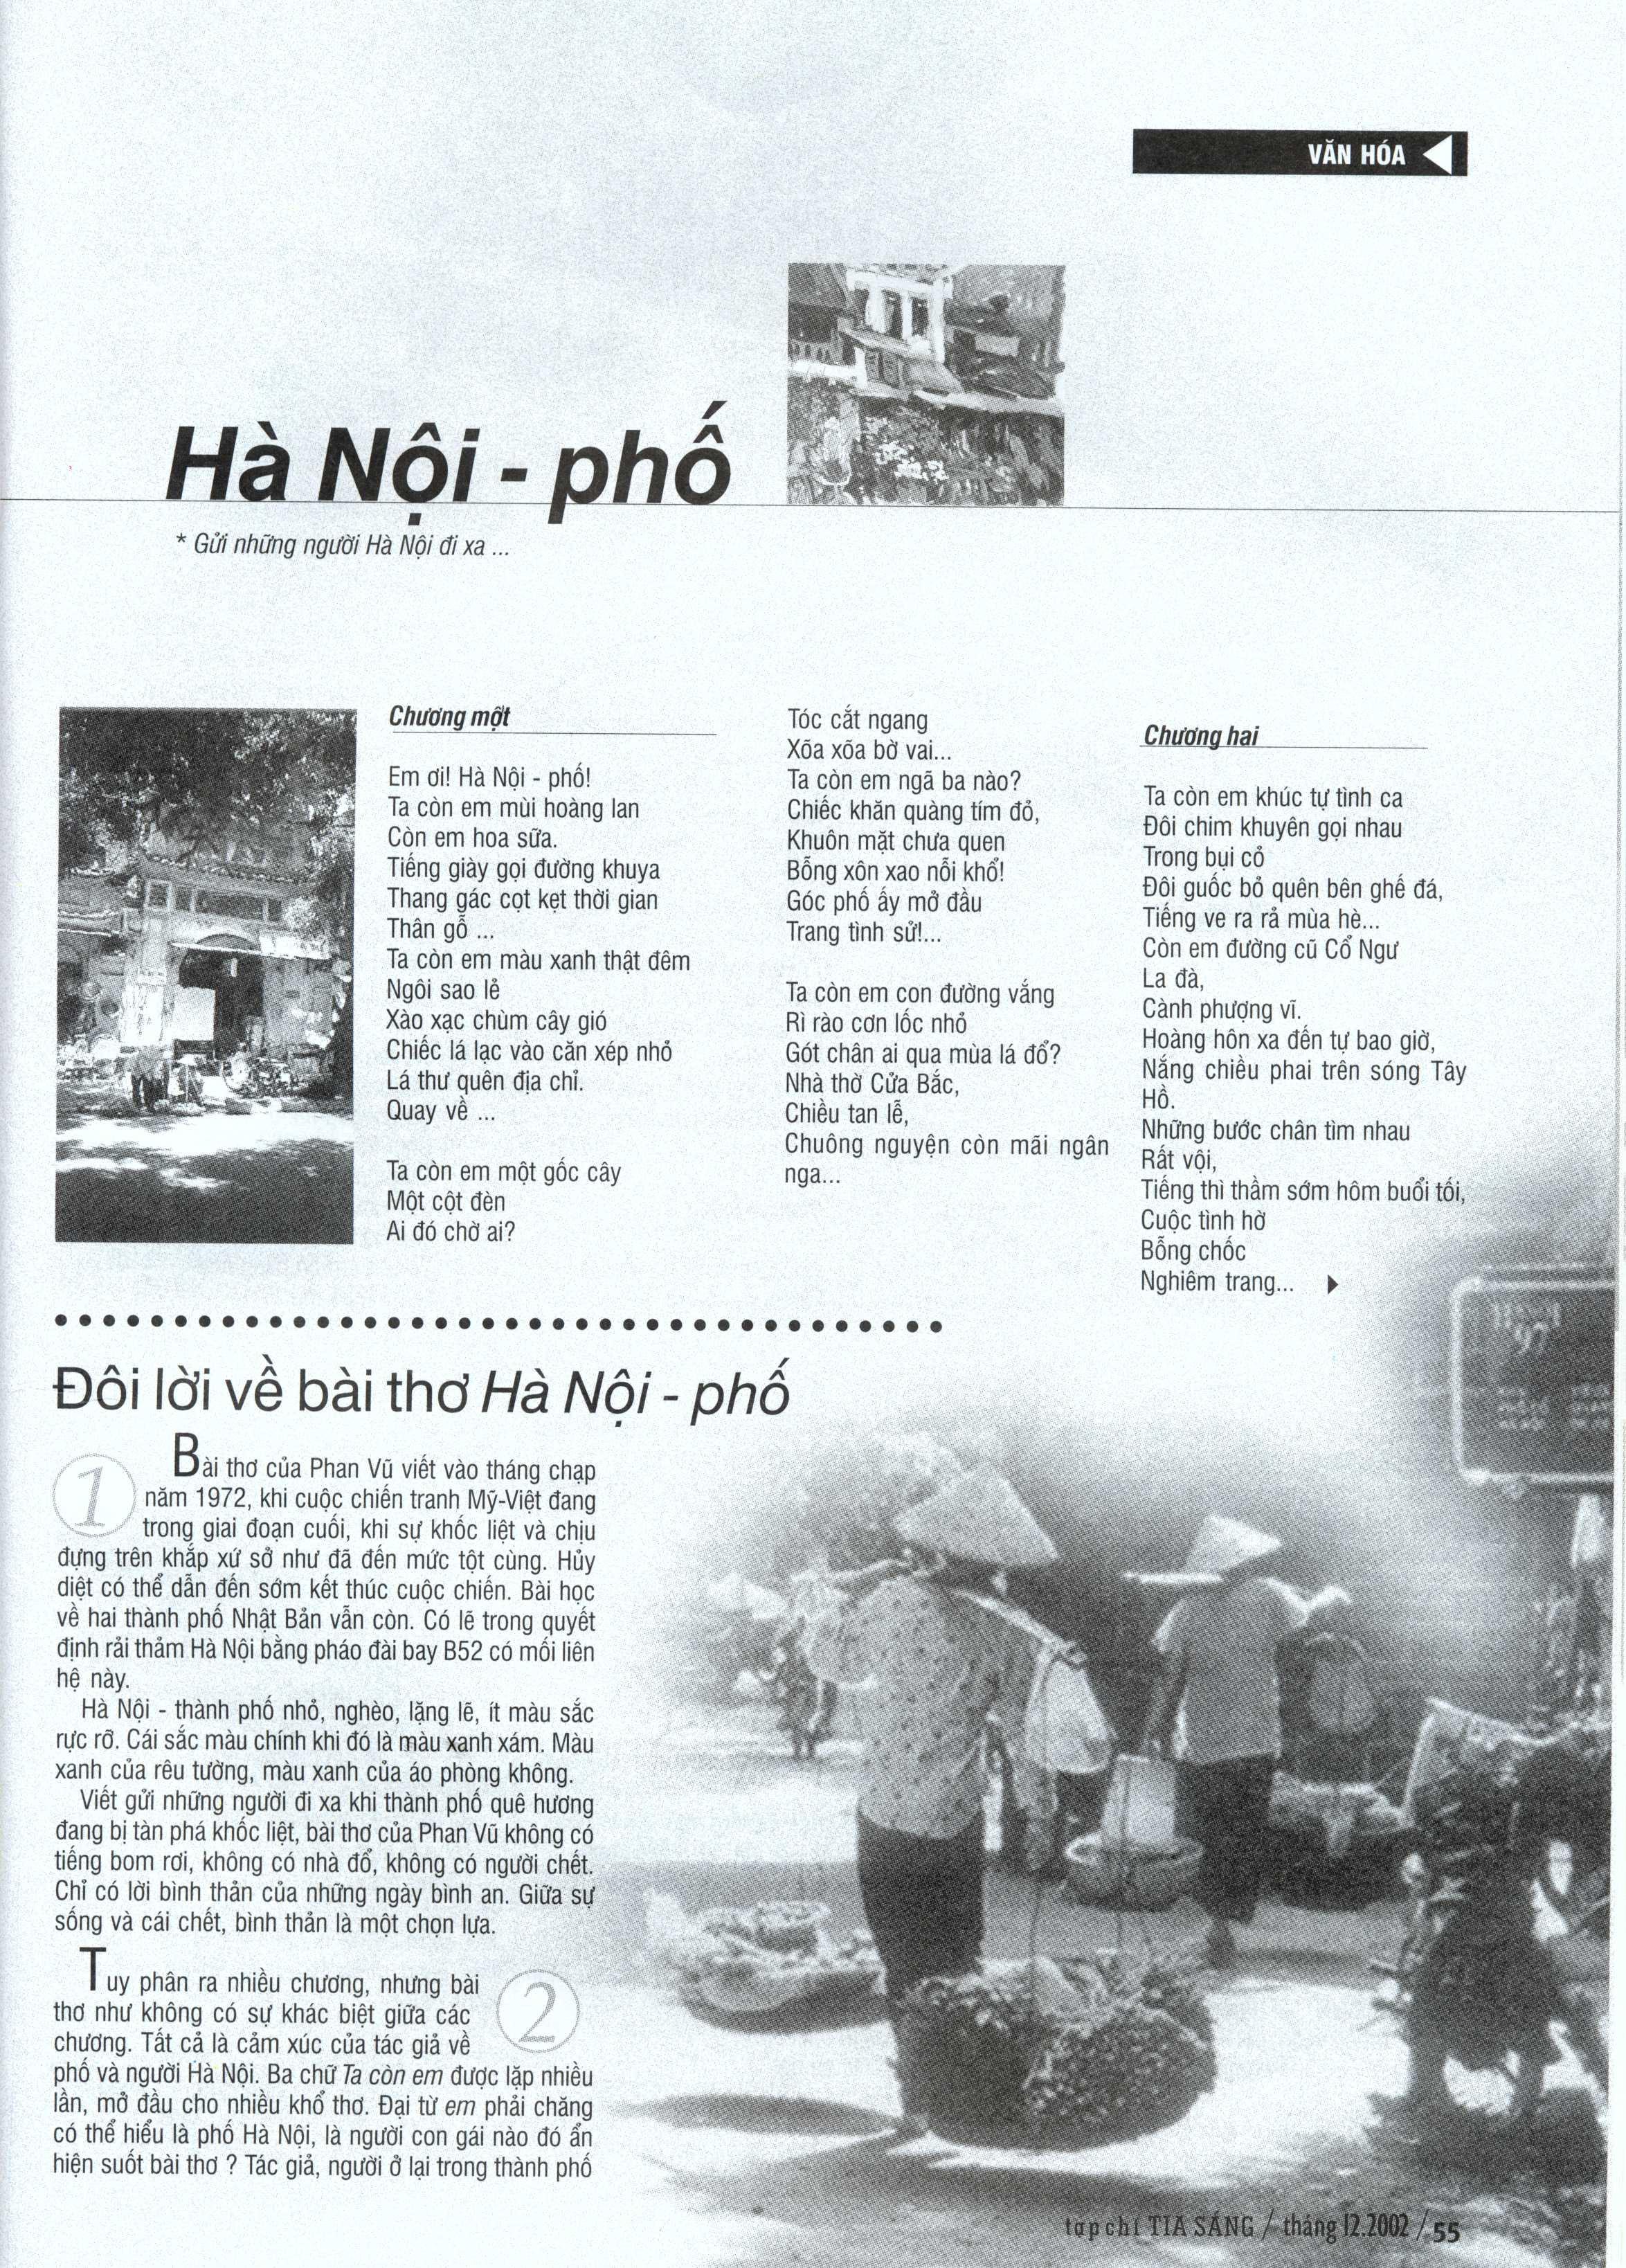 viet tien essay Vietnamese student's essay about philosophy wins american contest, nguyen tien thanh, social news, vietnamnet bridge, english news, vietnam news, news vietnam, vietnamnet news, vietnam net.